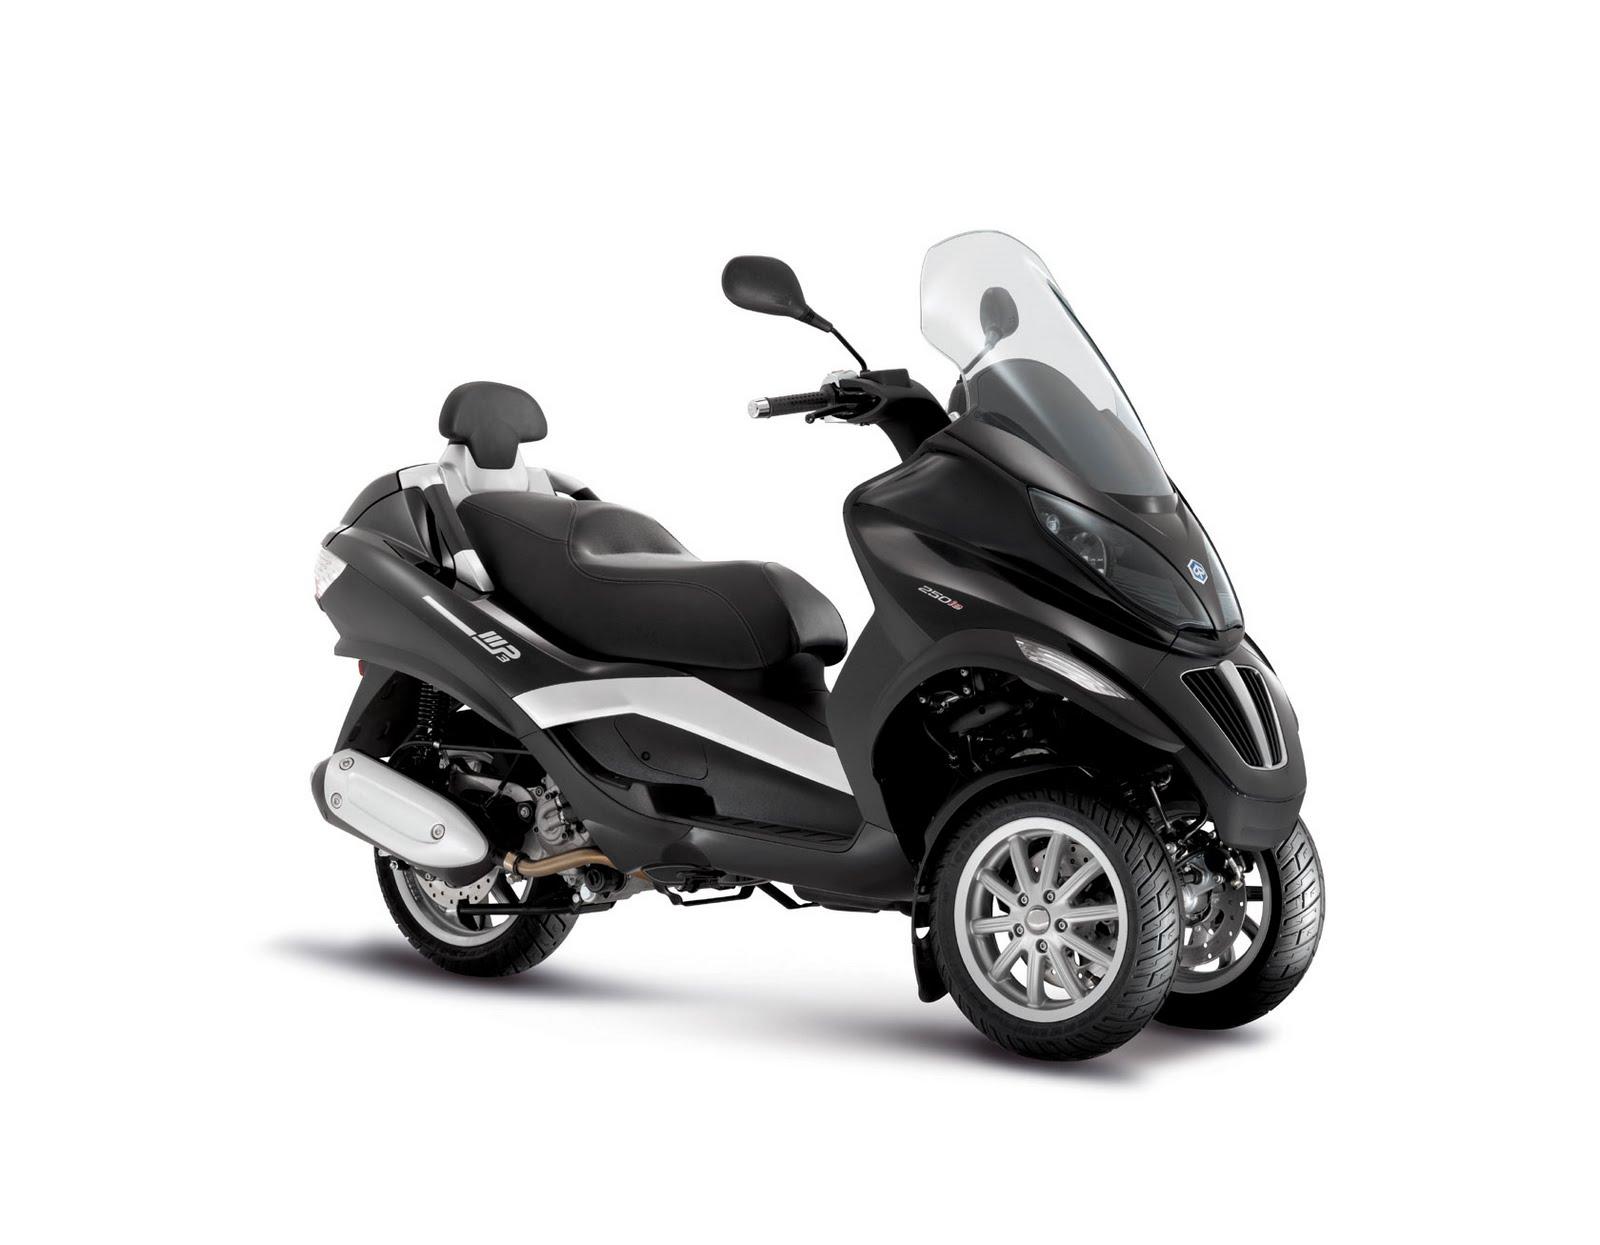 best motorcycle 2009 piaggio mp3 250. Black Bedroom Furniture Sets. Home Design Ideas